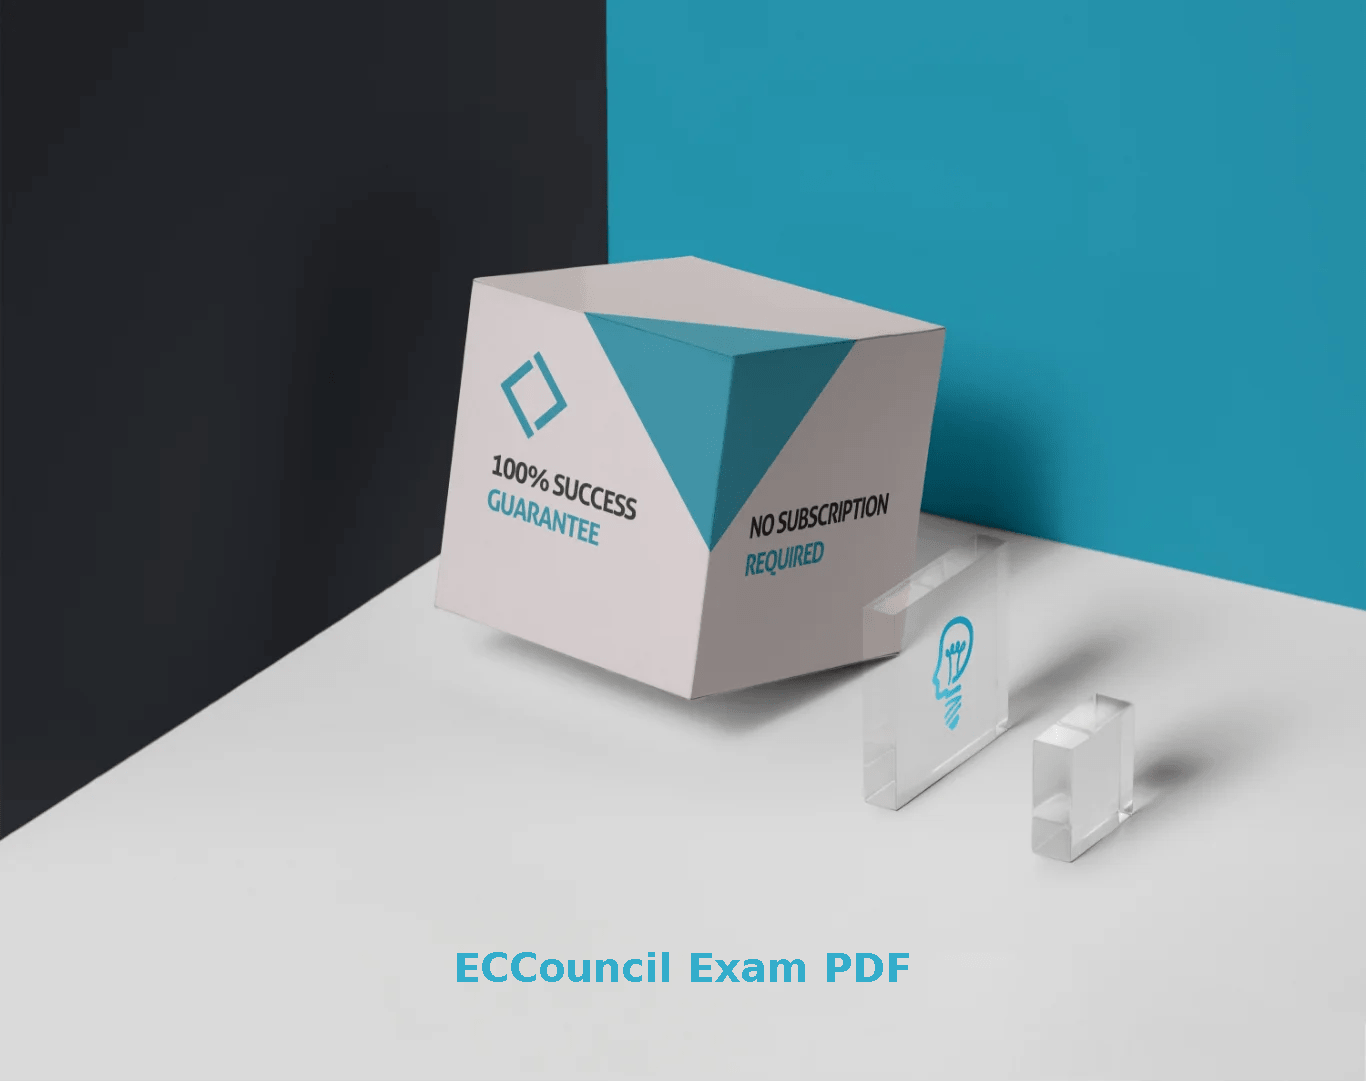 ECCouncil Exam PDF